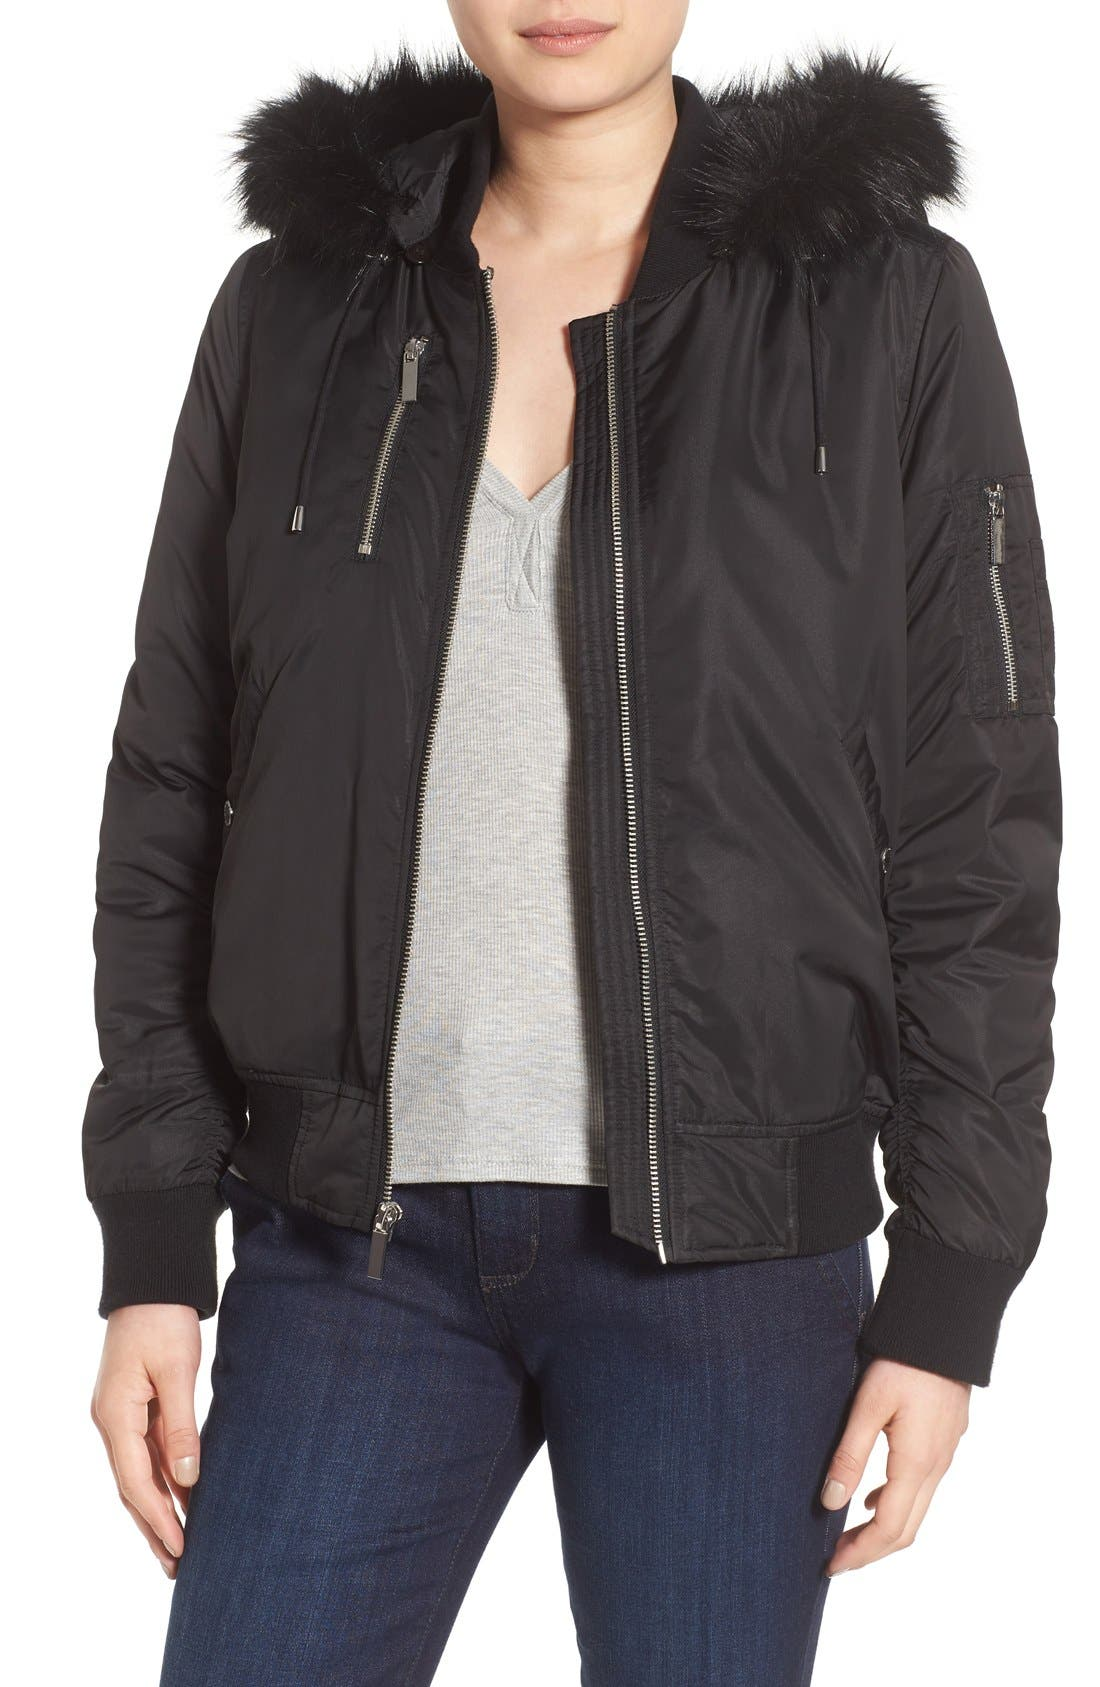 Women's parka coats with fur hood sale